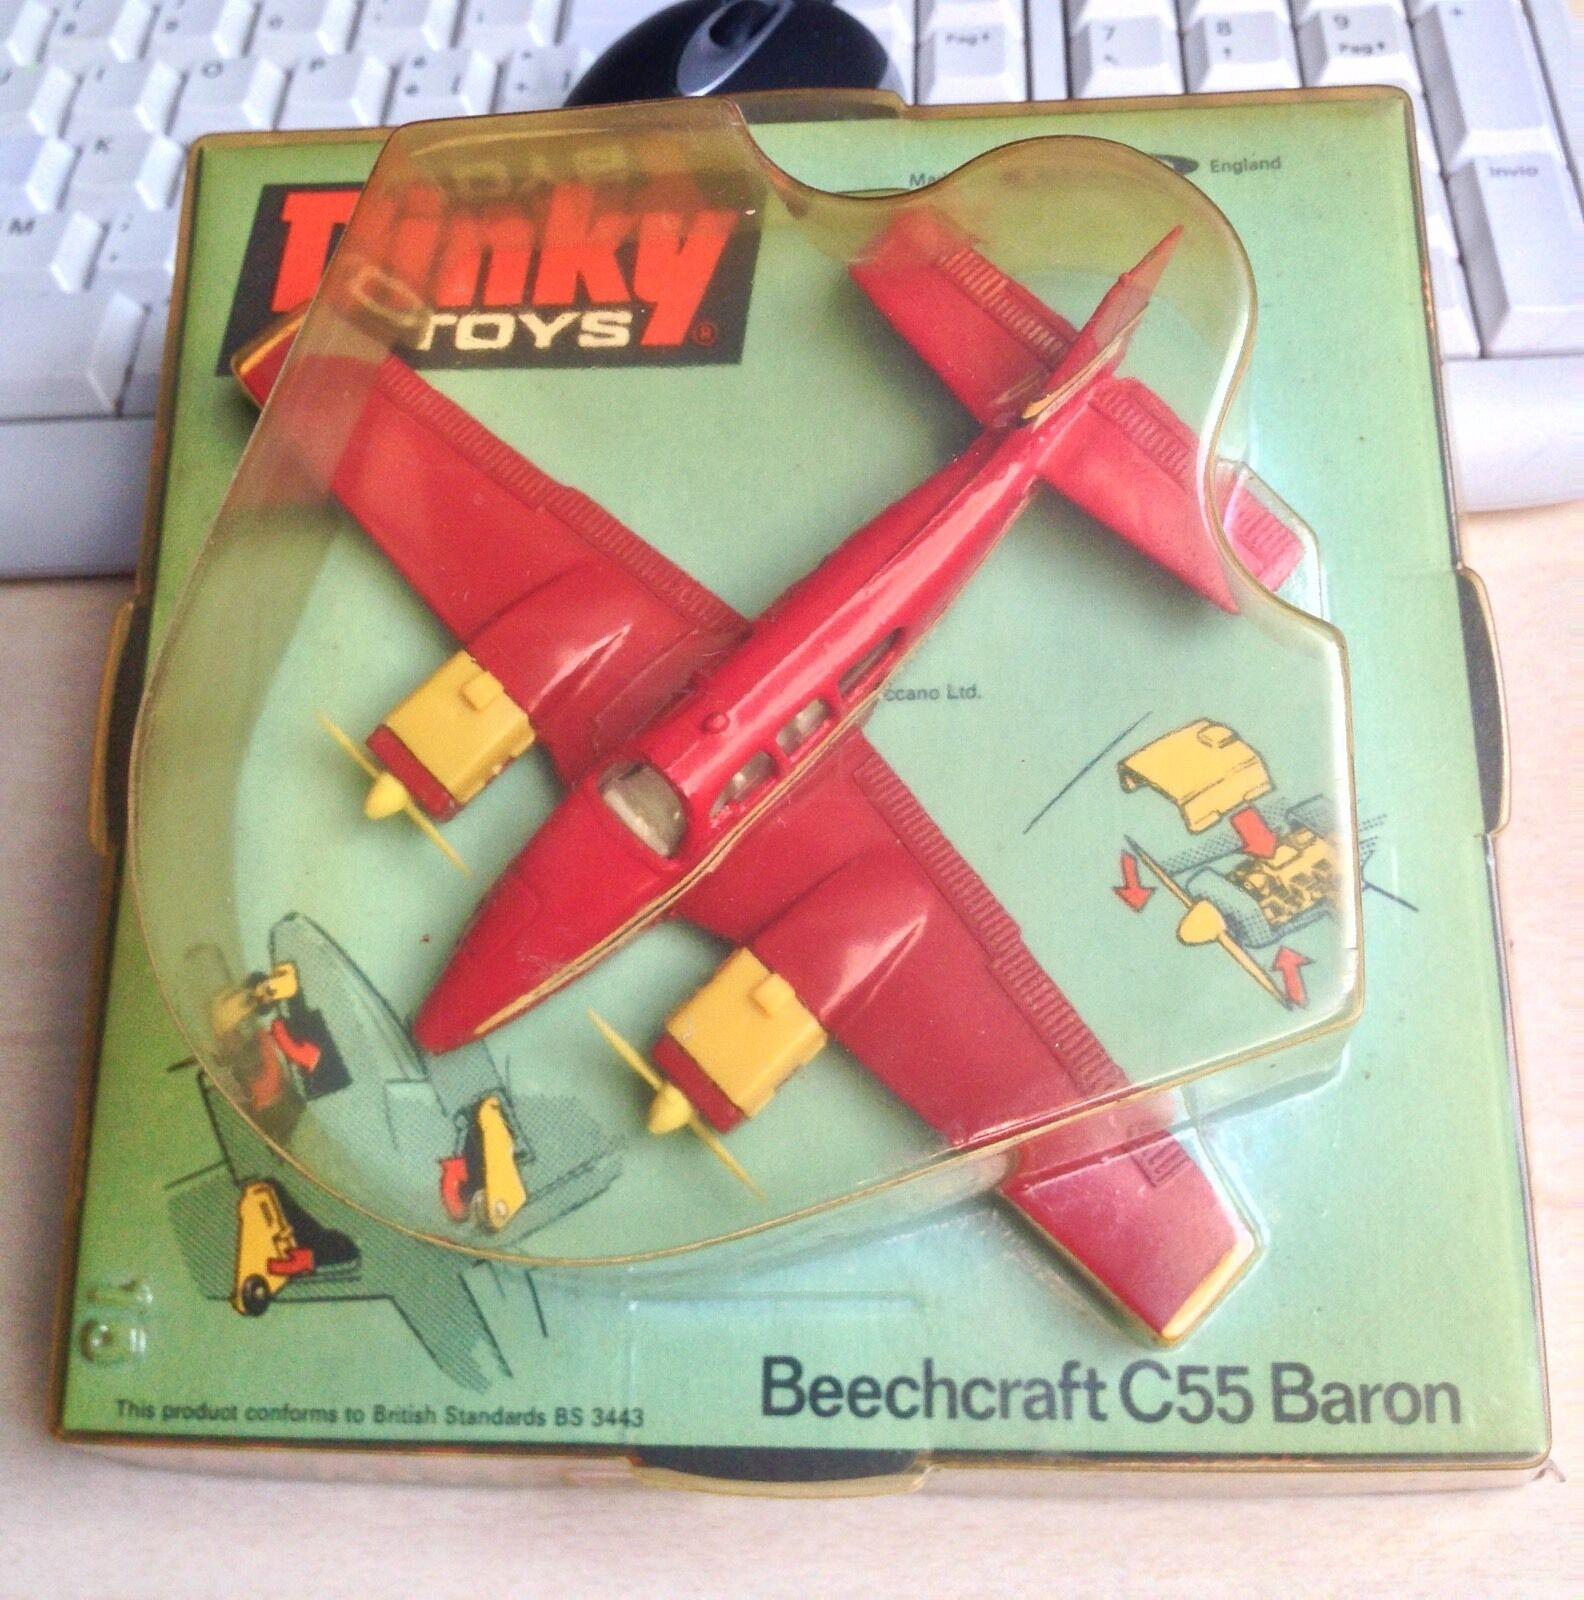 DINKY TOYS Beechccraft C55 Baron never opened